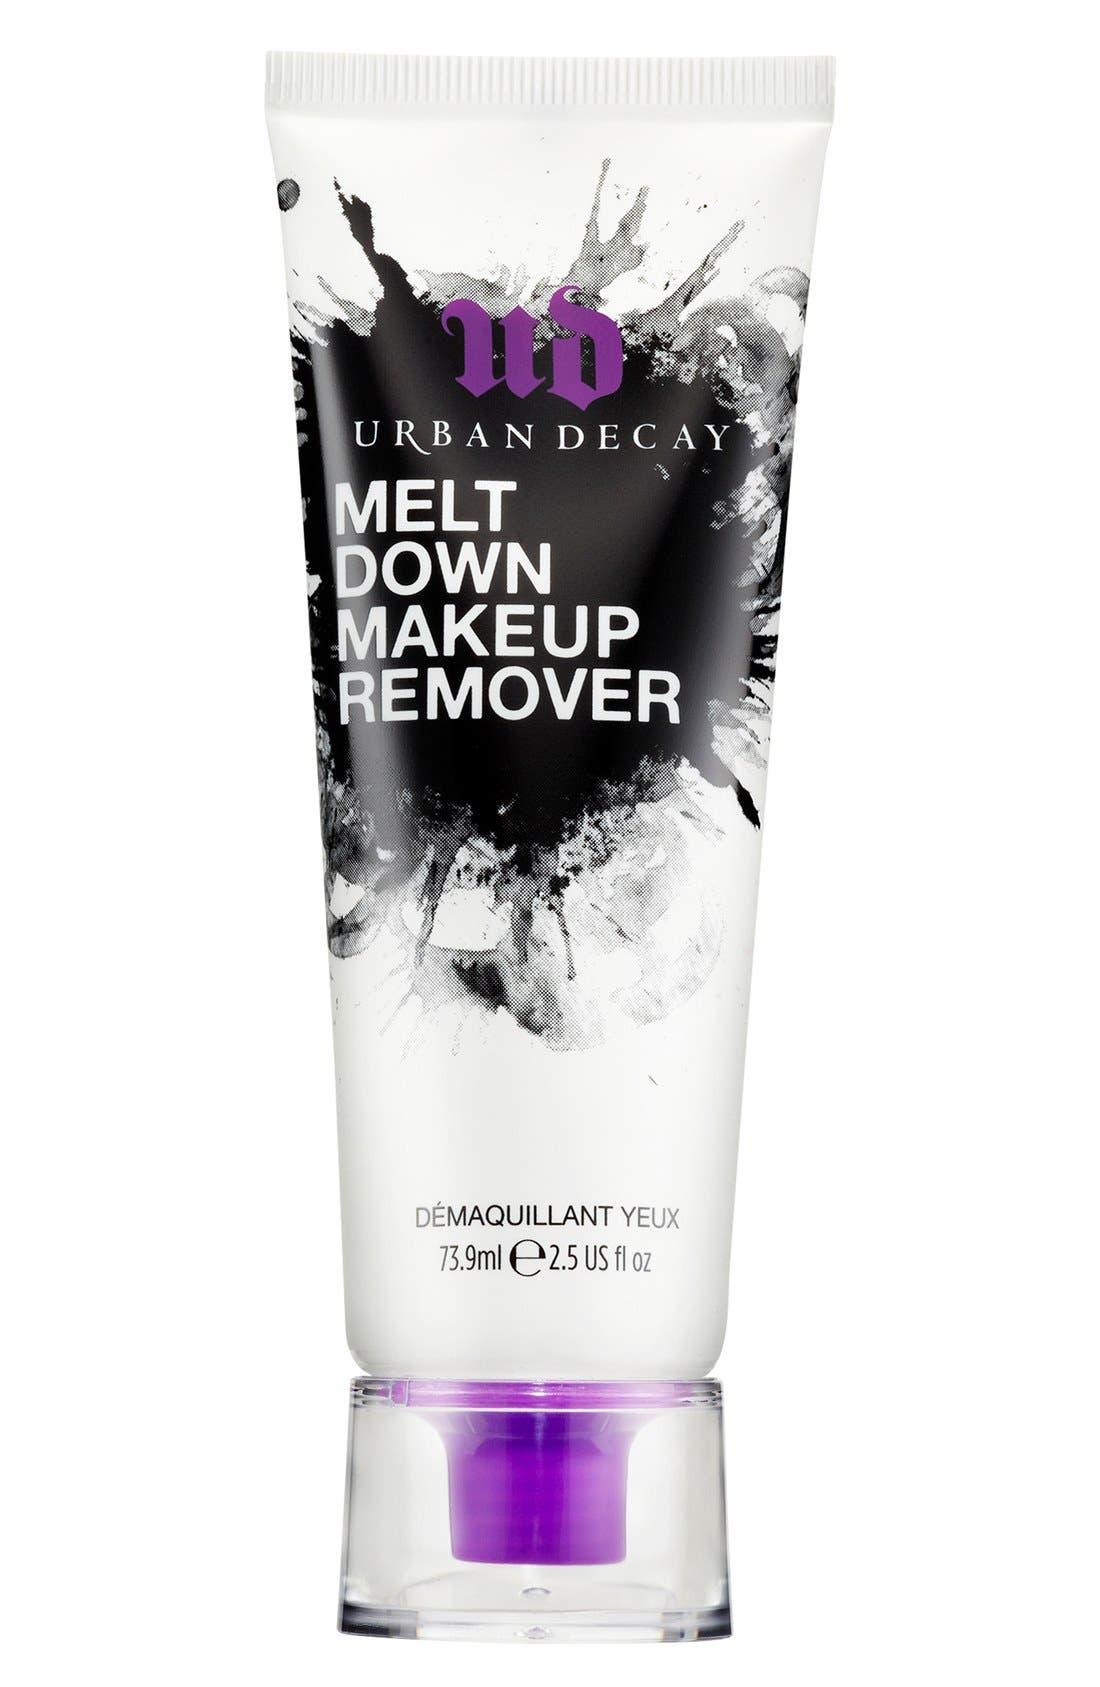 Urban Decay Meltdown Makeup Remover